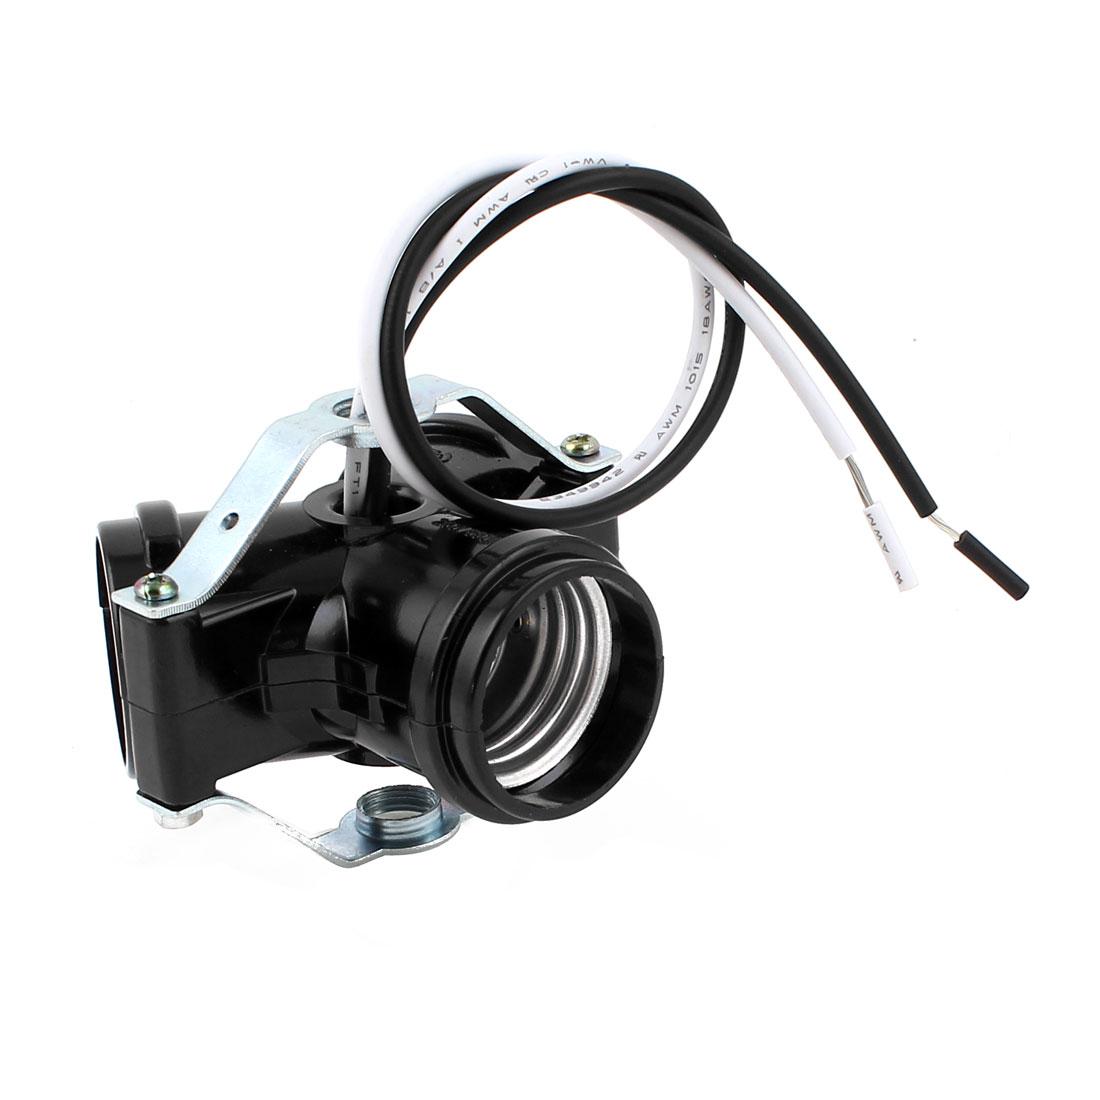 Wired 3 Way E27 Bulb Base Screw Lamp Holder Socket Converter